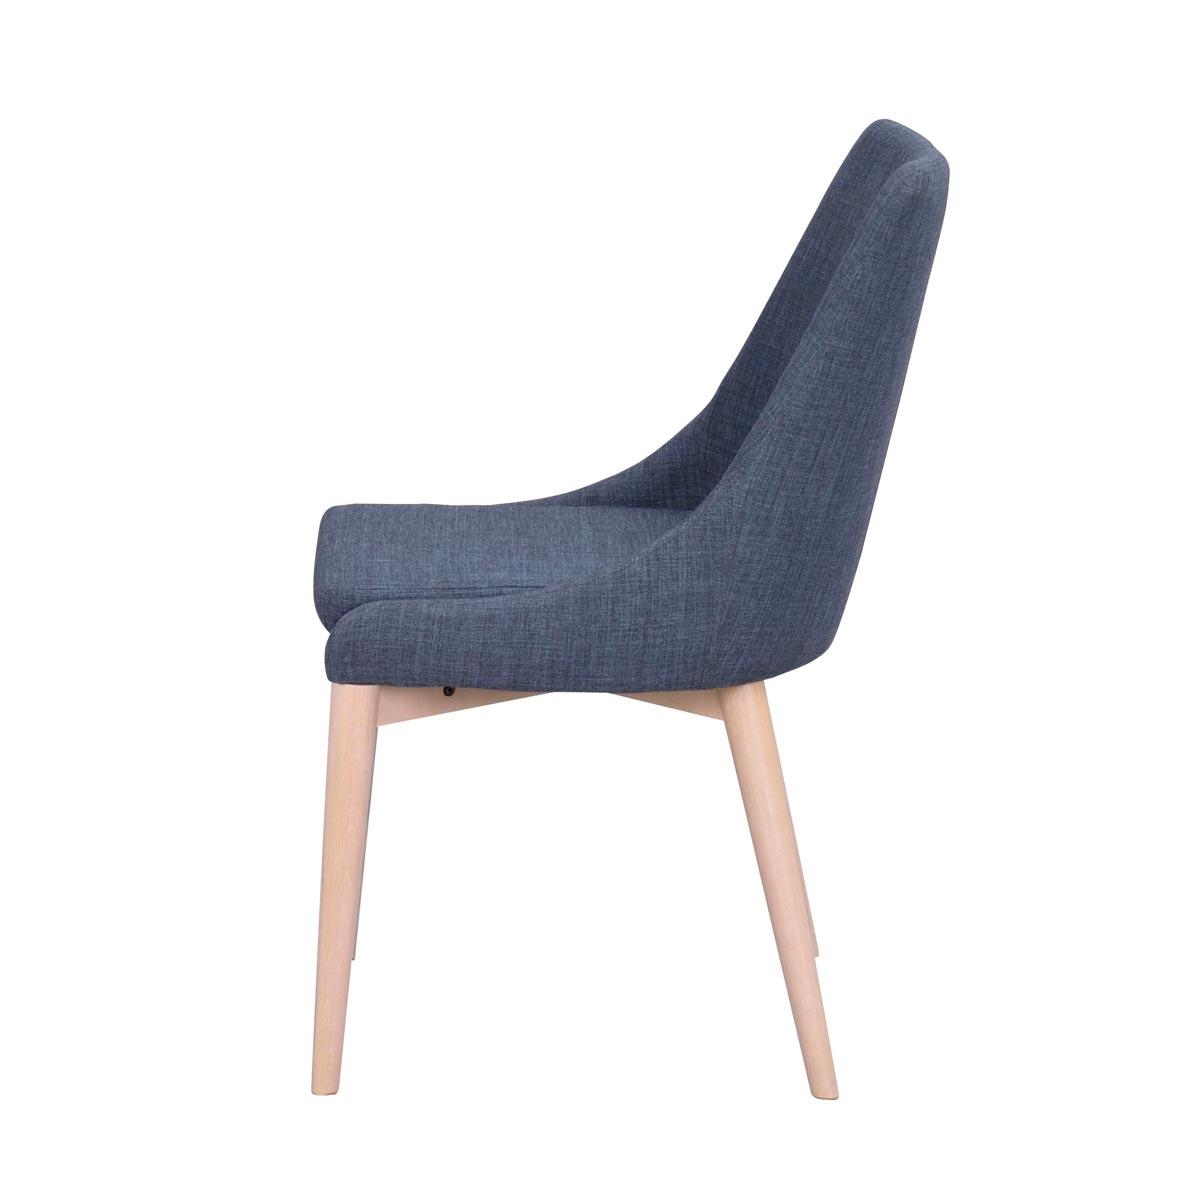 Bea-stol-blått-tyg_wwR-118317_c